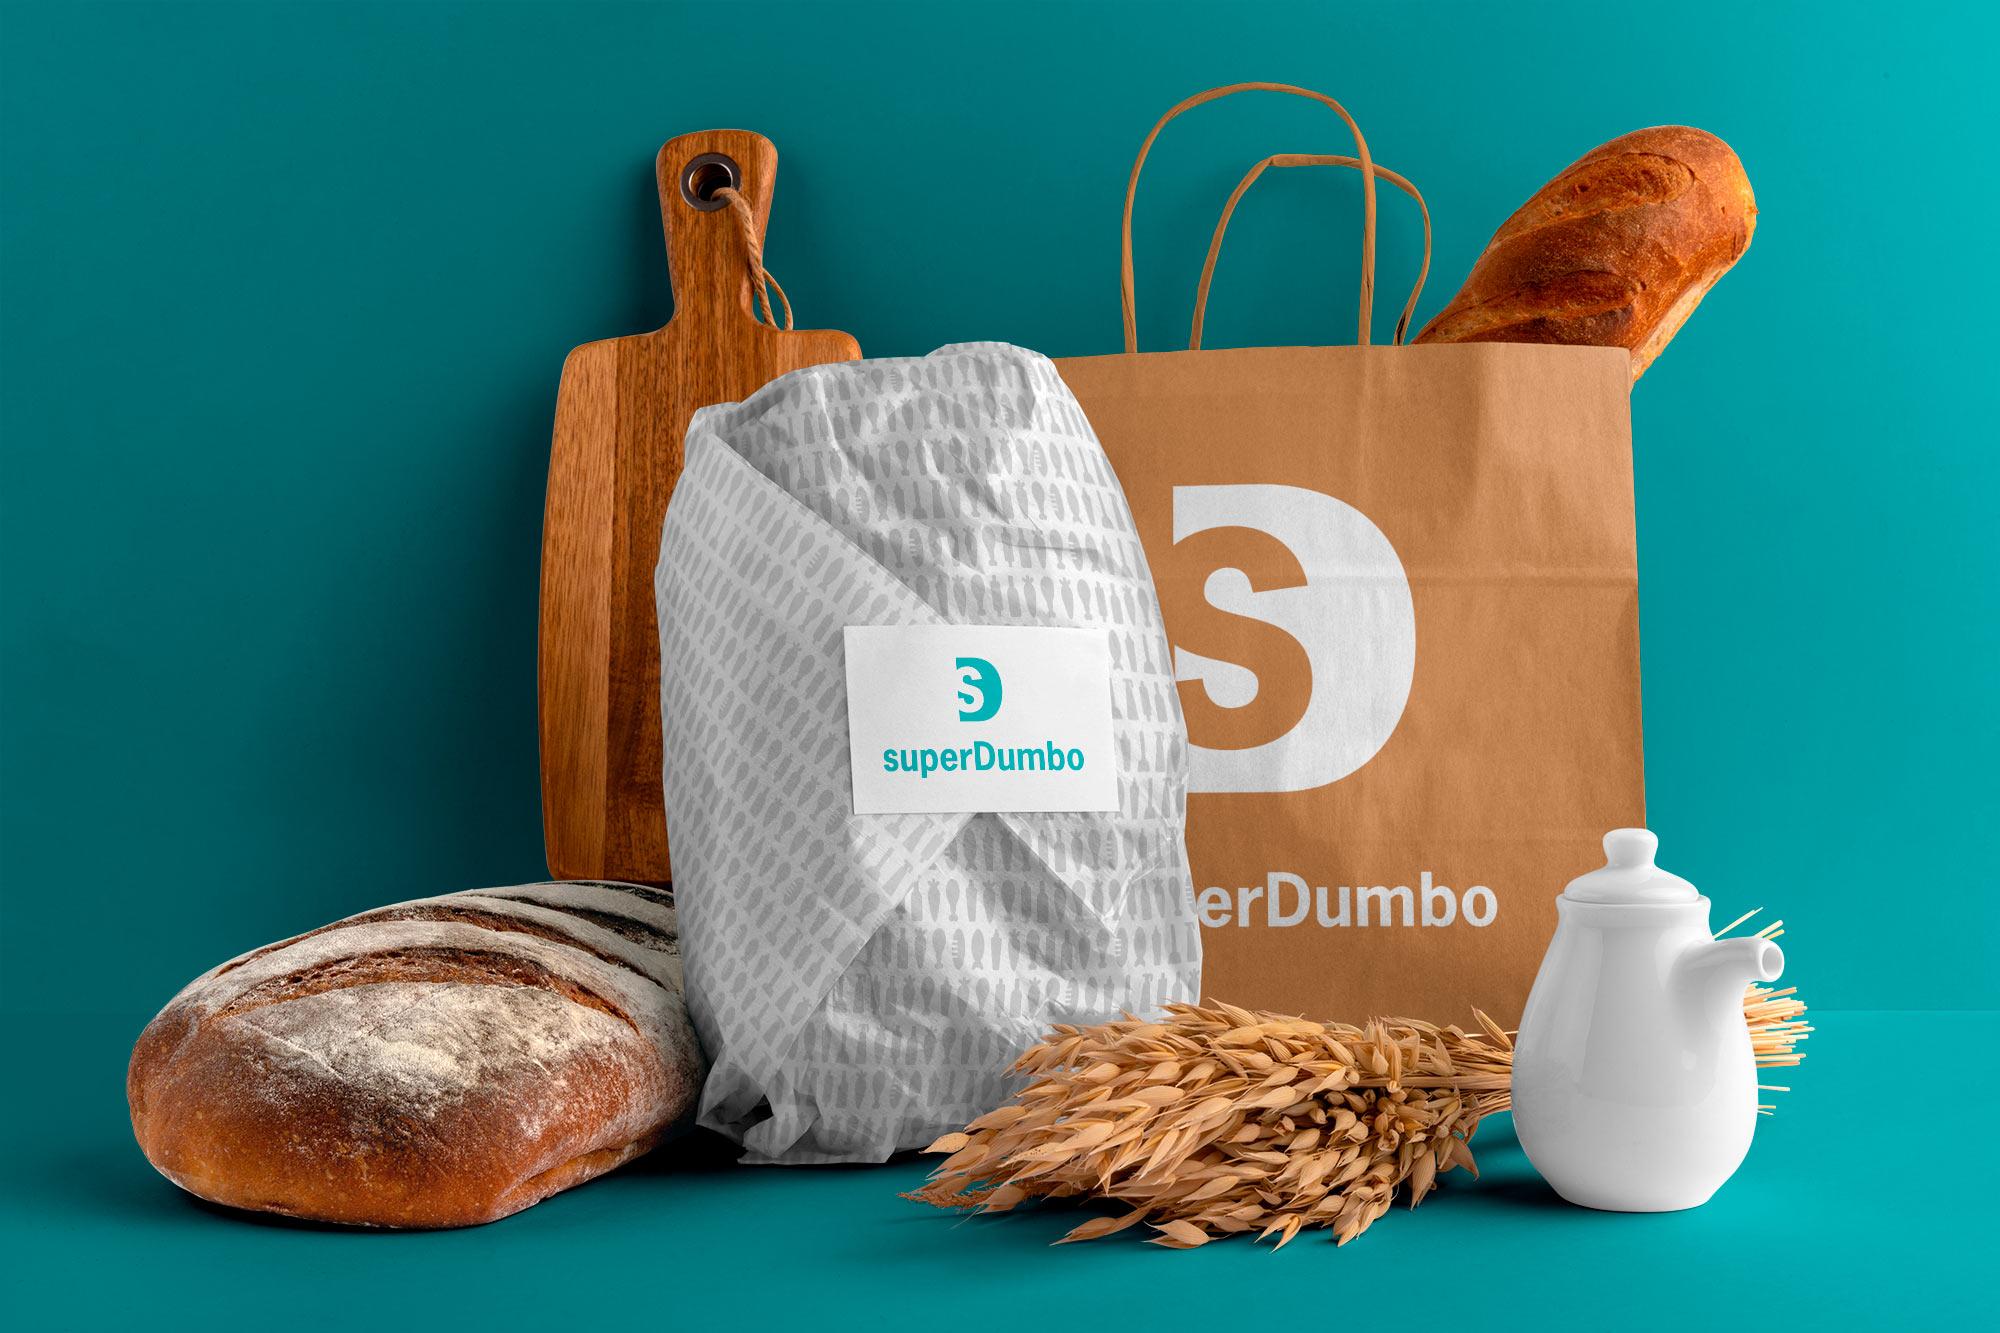 superdumbo-branding-12